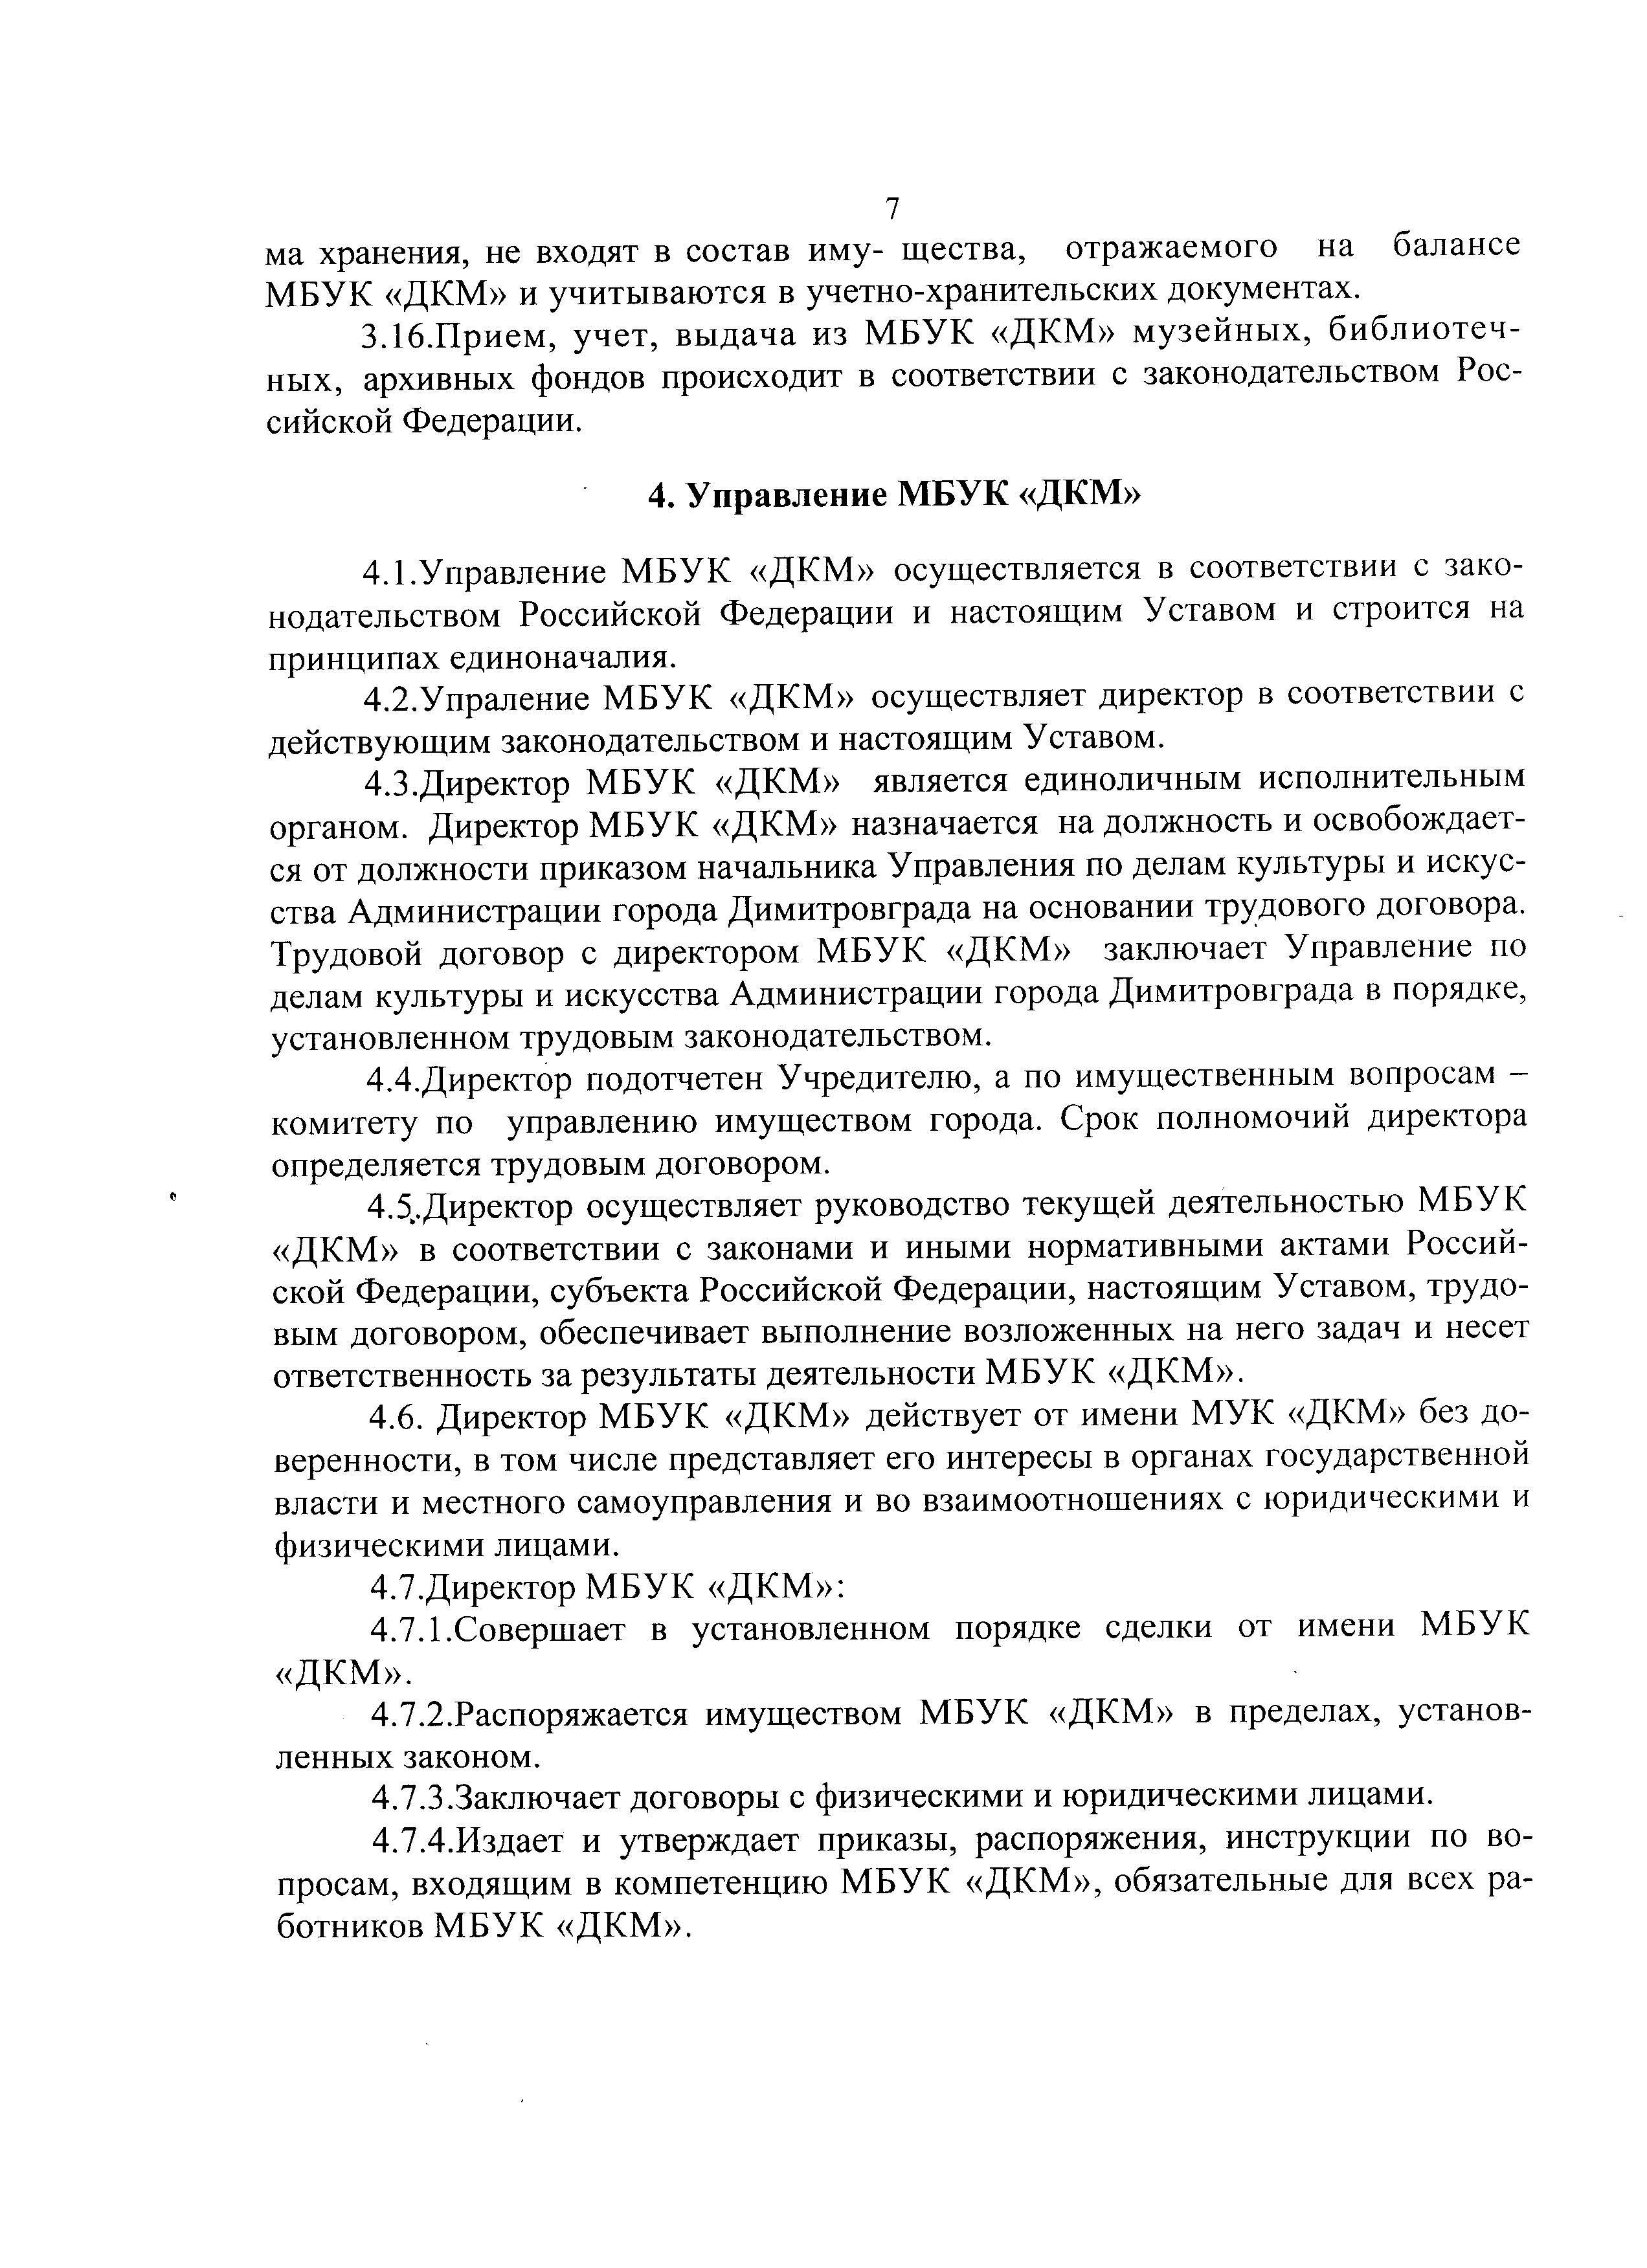 устав_6